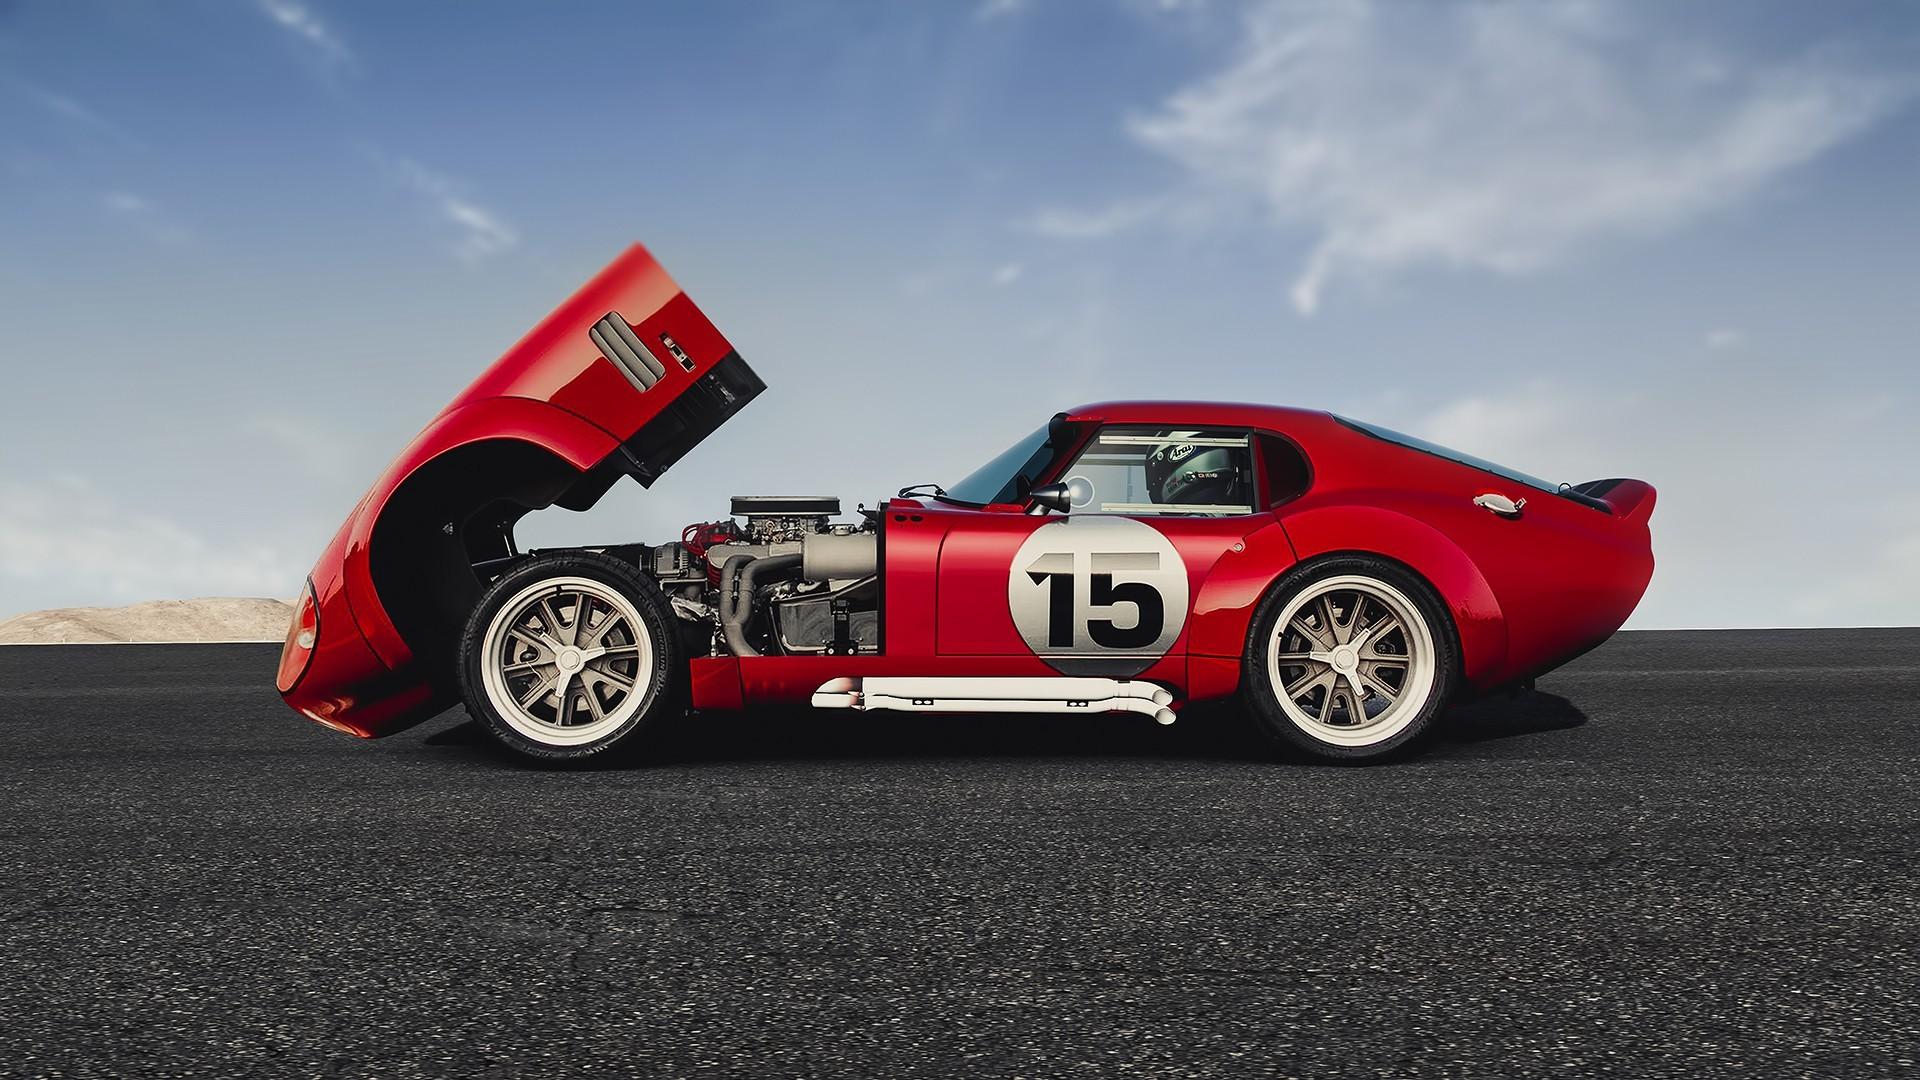 car, Shelby Cobra Daytona Wallpapers HD / Desktop and Mobile Backgrounds